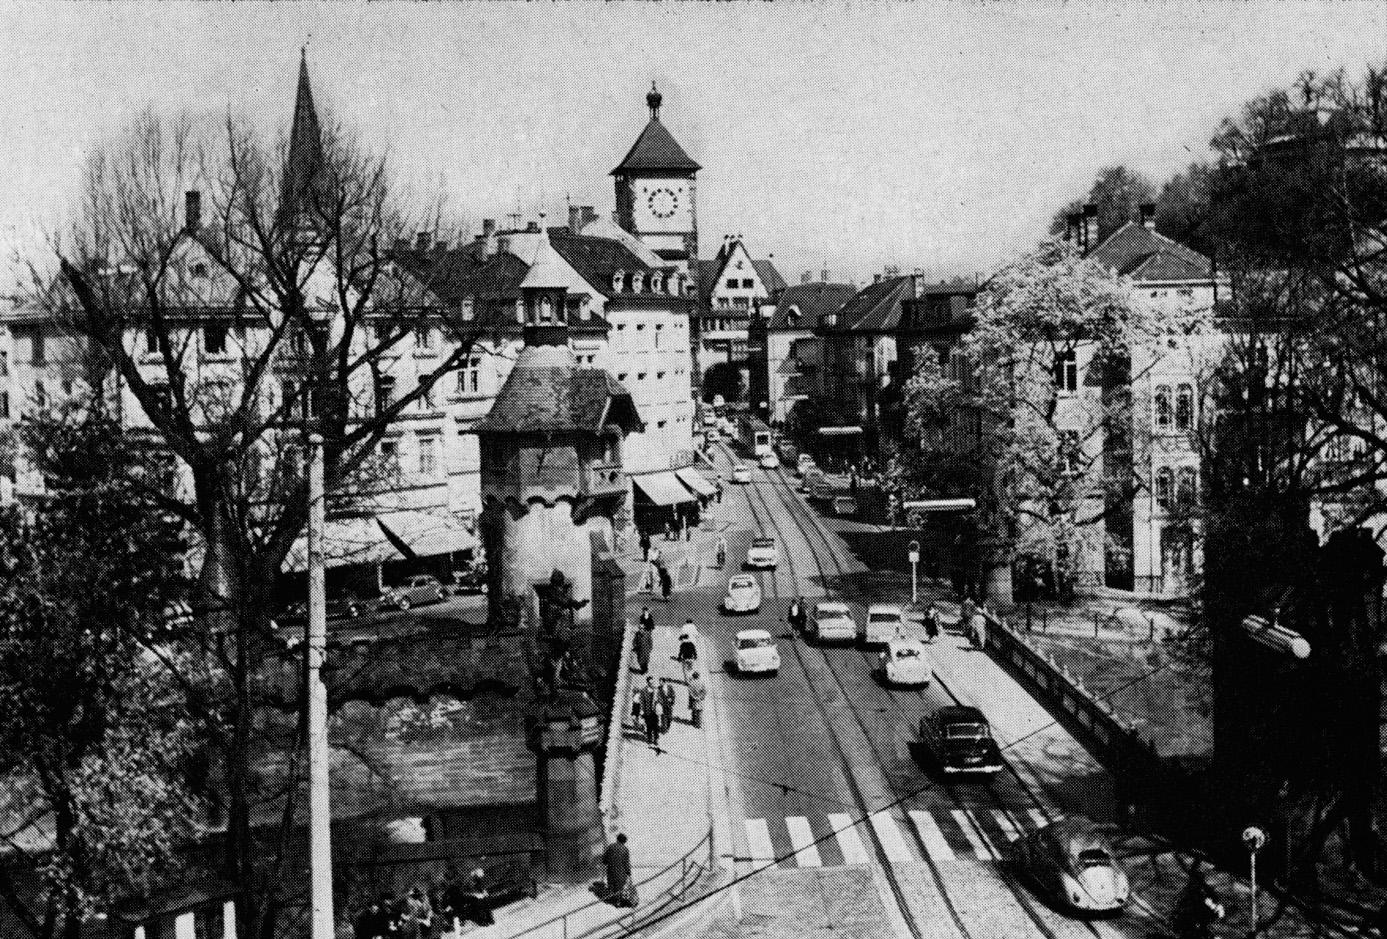 Schwabentorbrücke_Freiburg_1960er